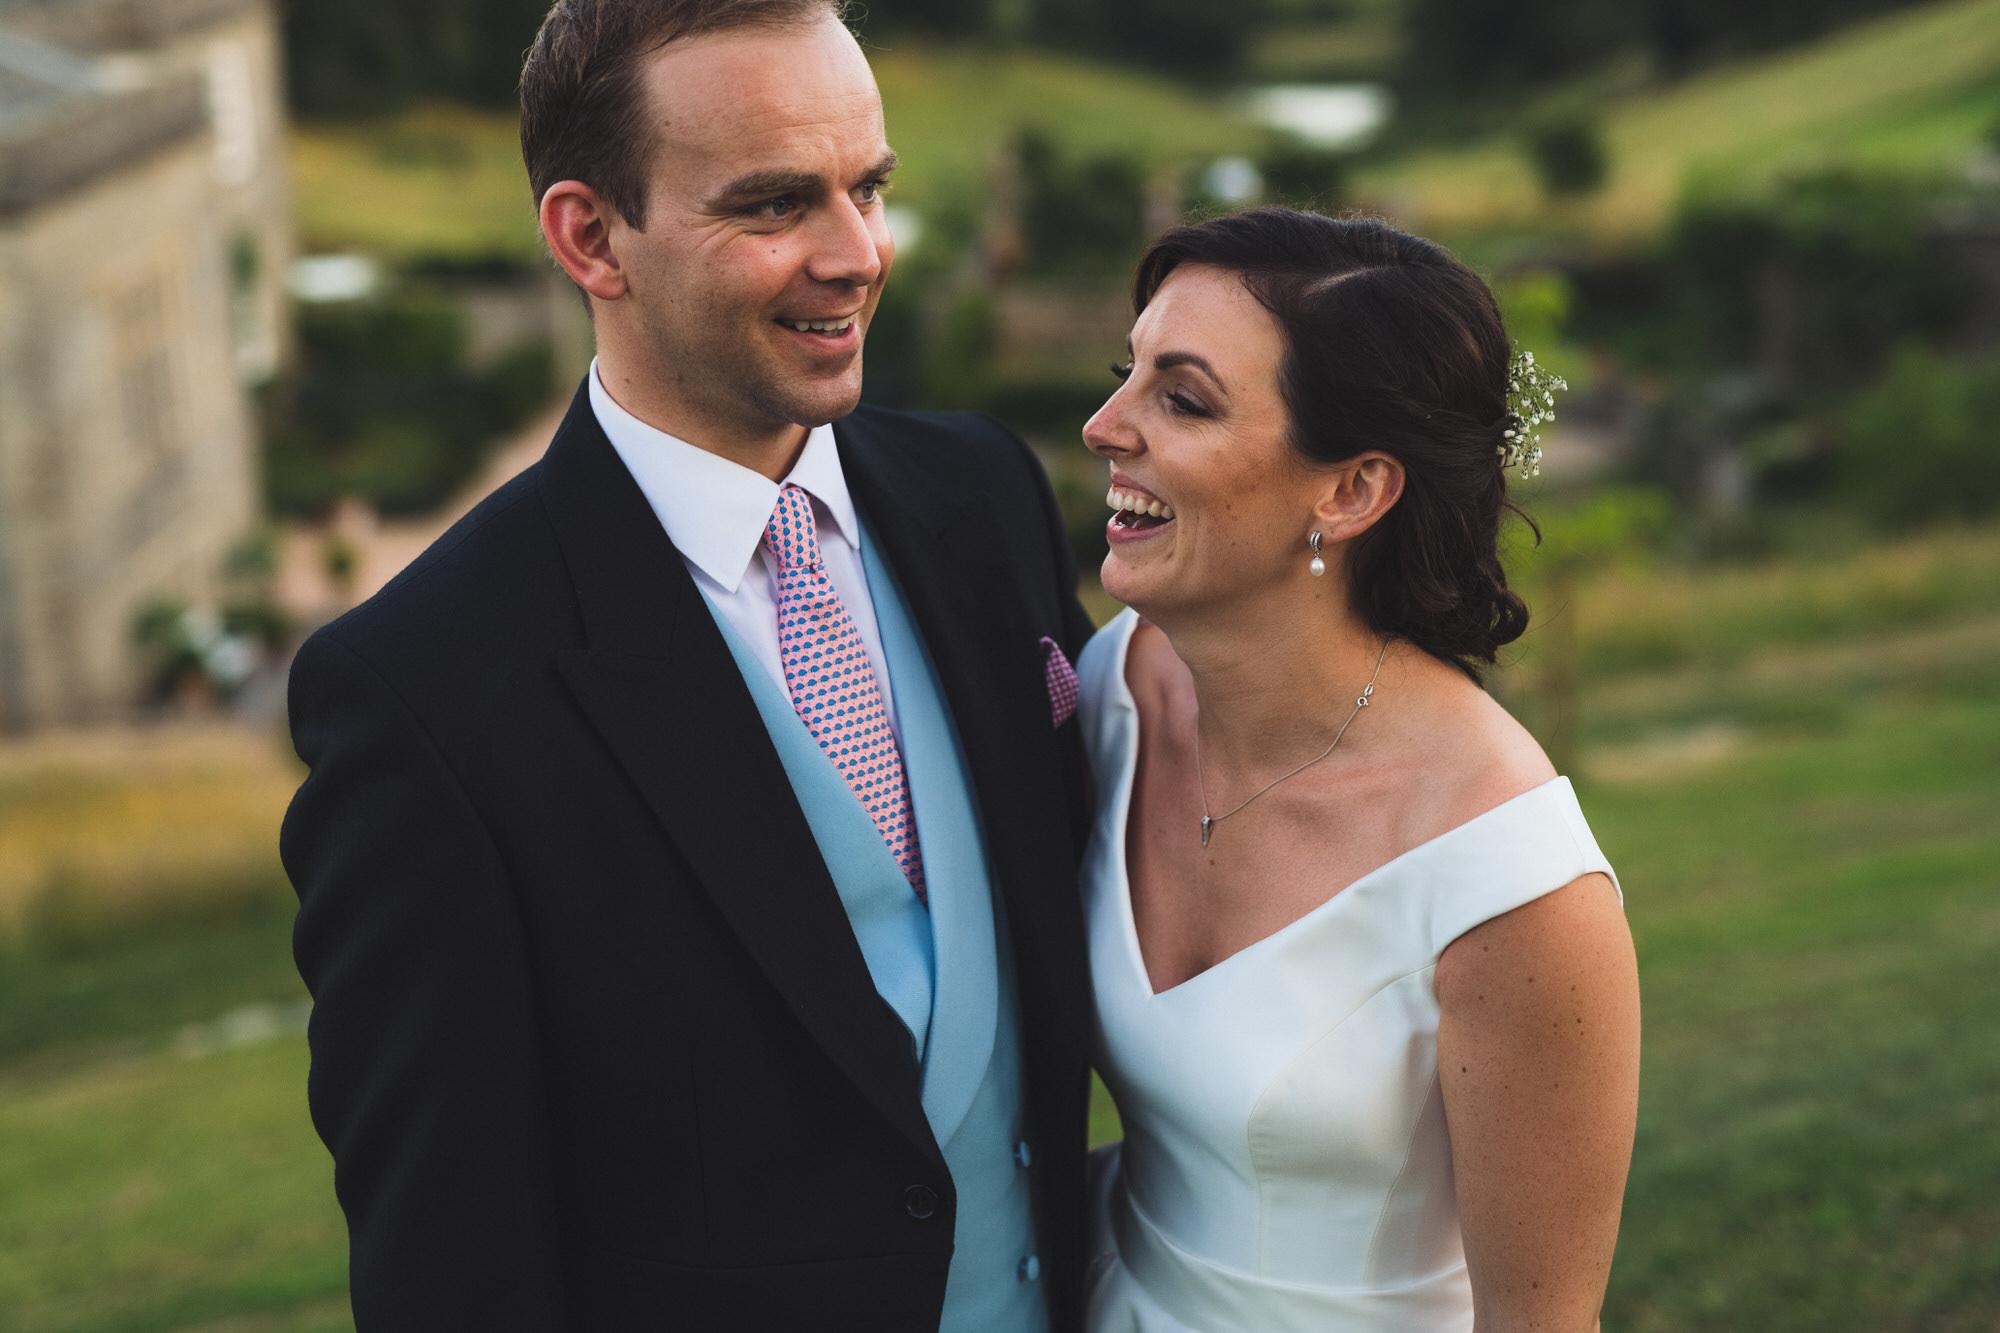 Shilstone wedding photographer 46